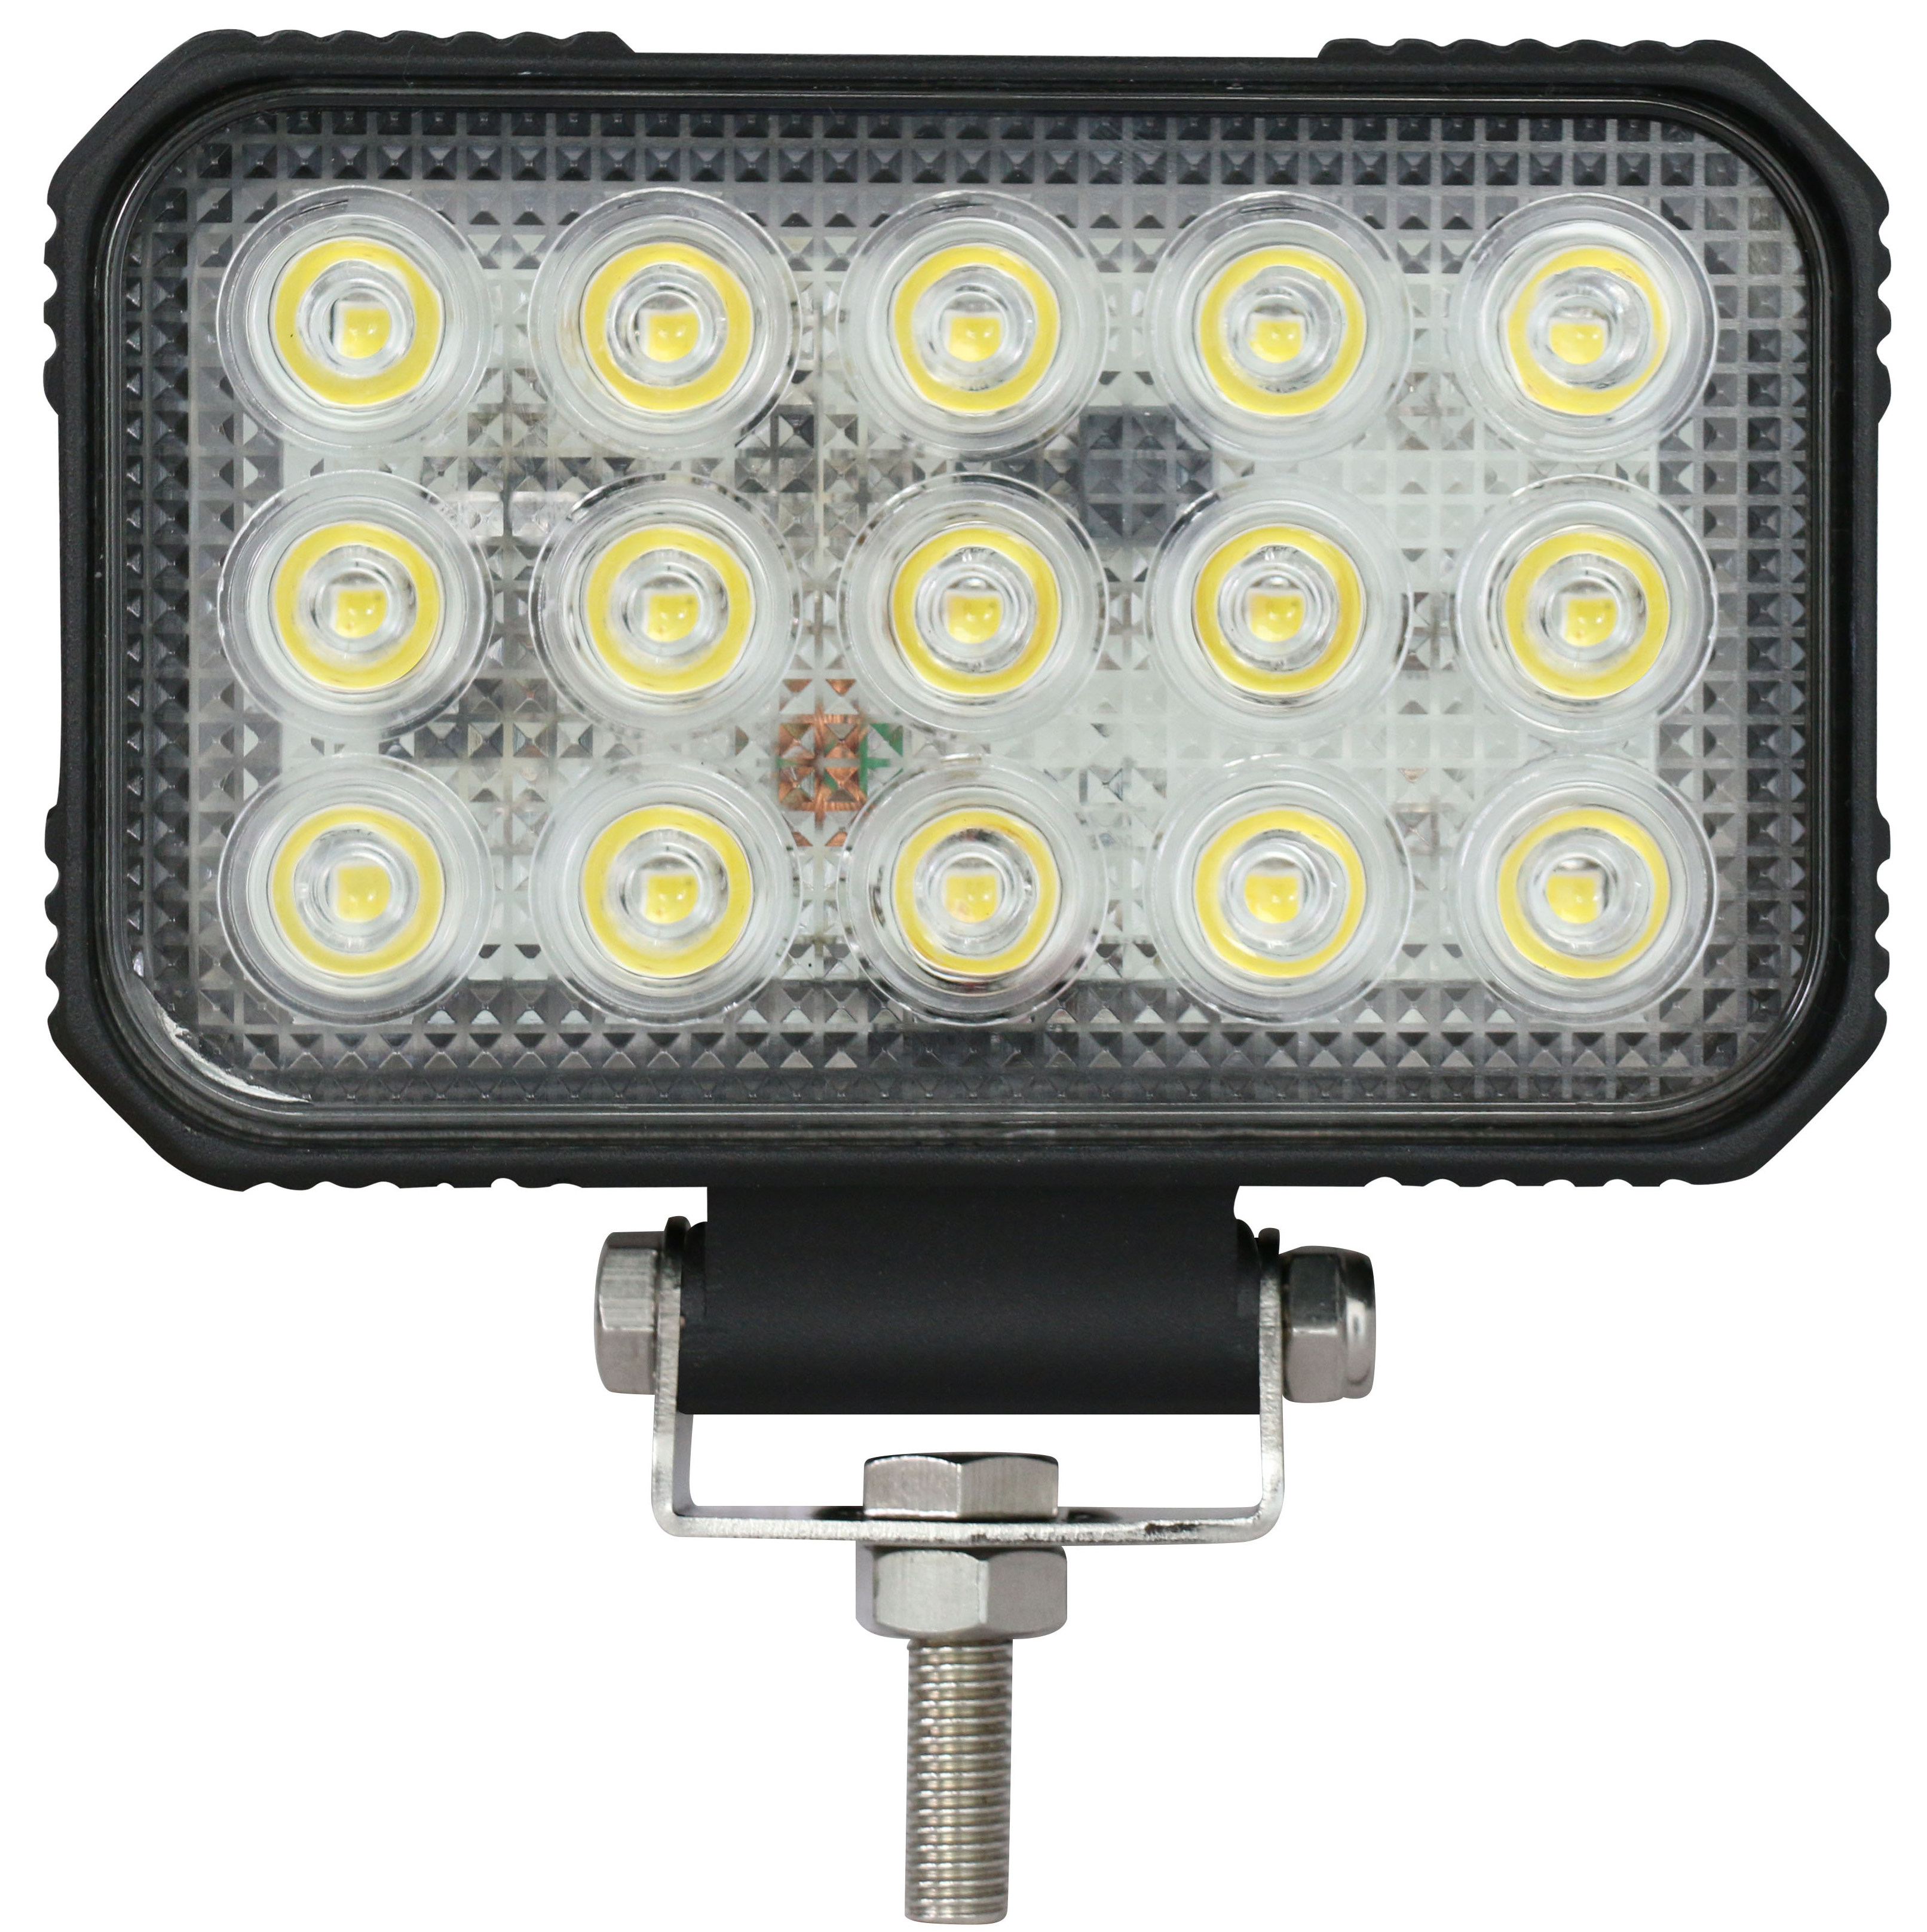 LED 225Watt Slim Rectangular Work Light  Custer Products